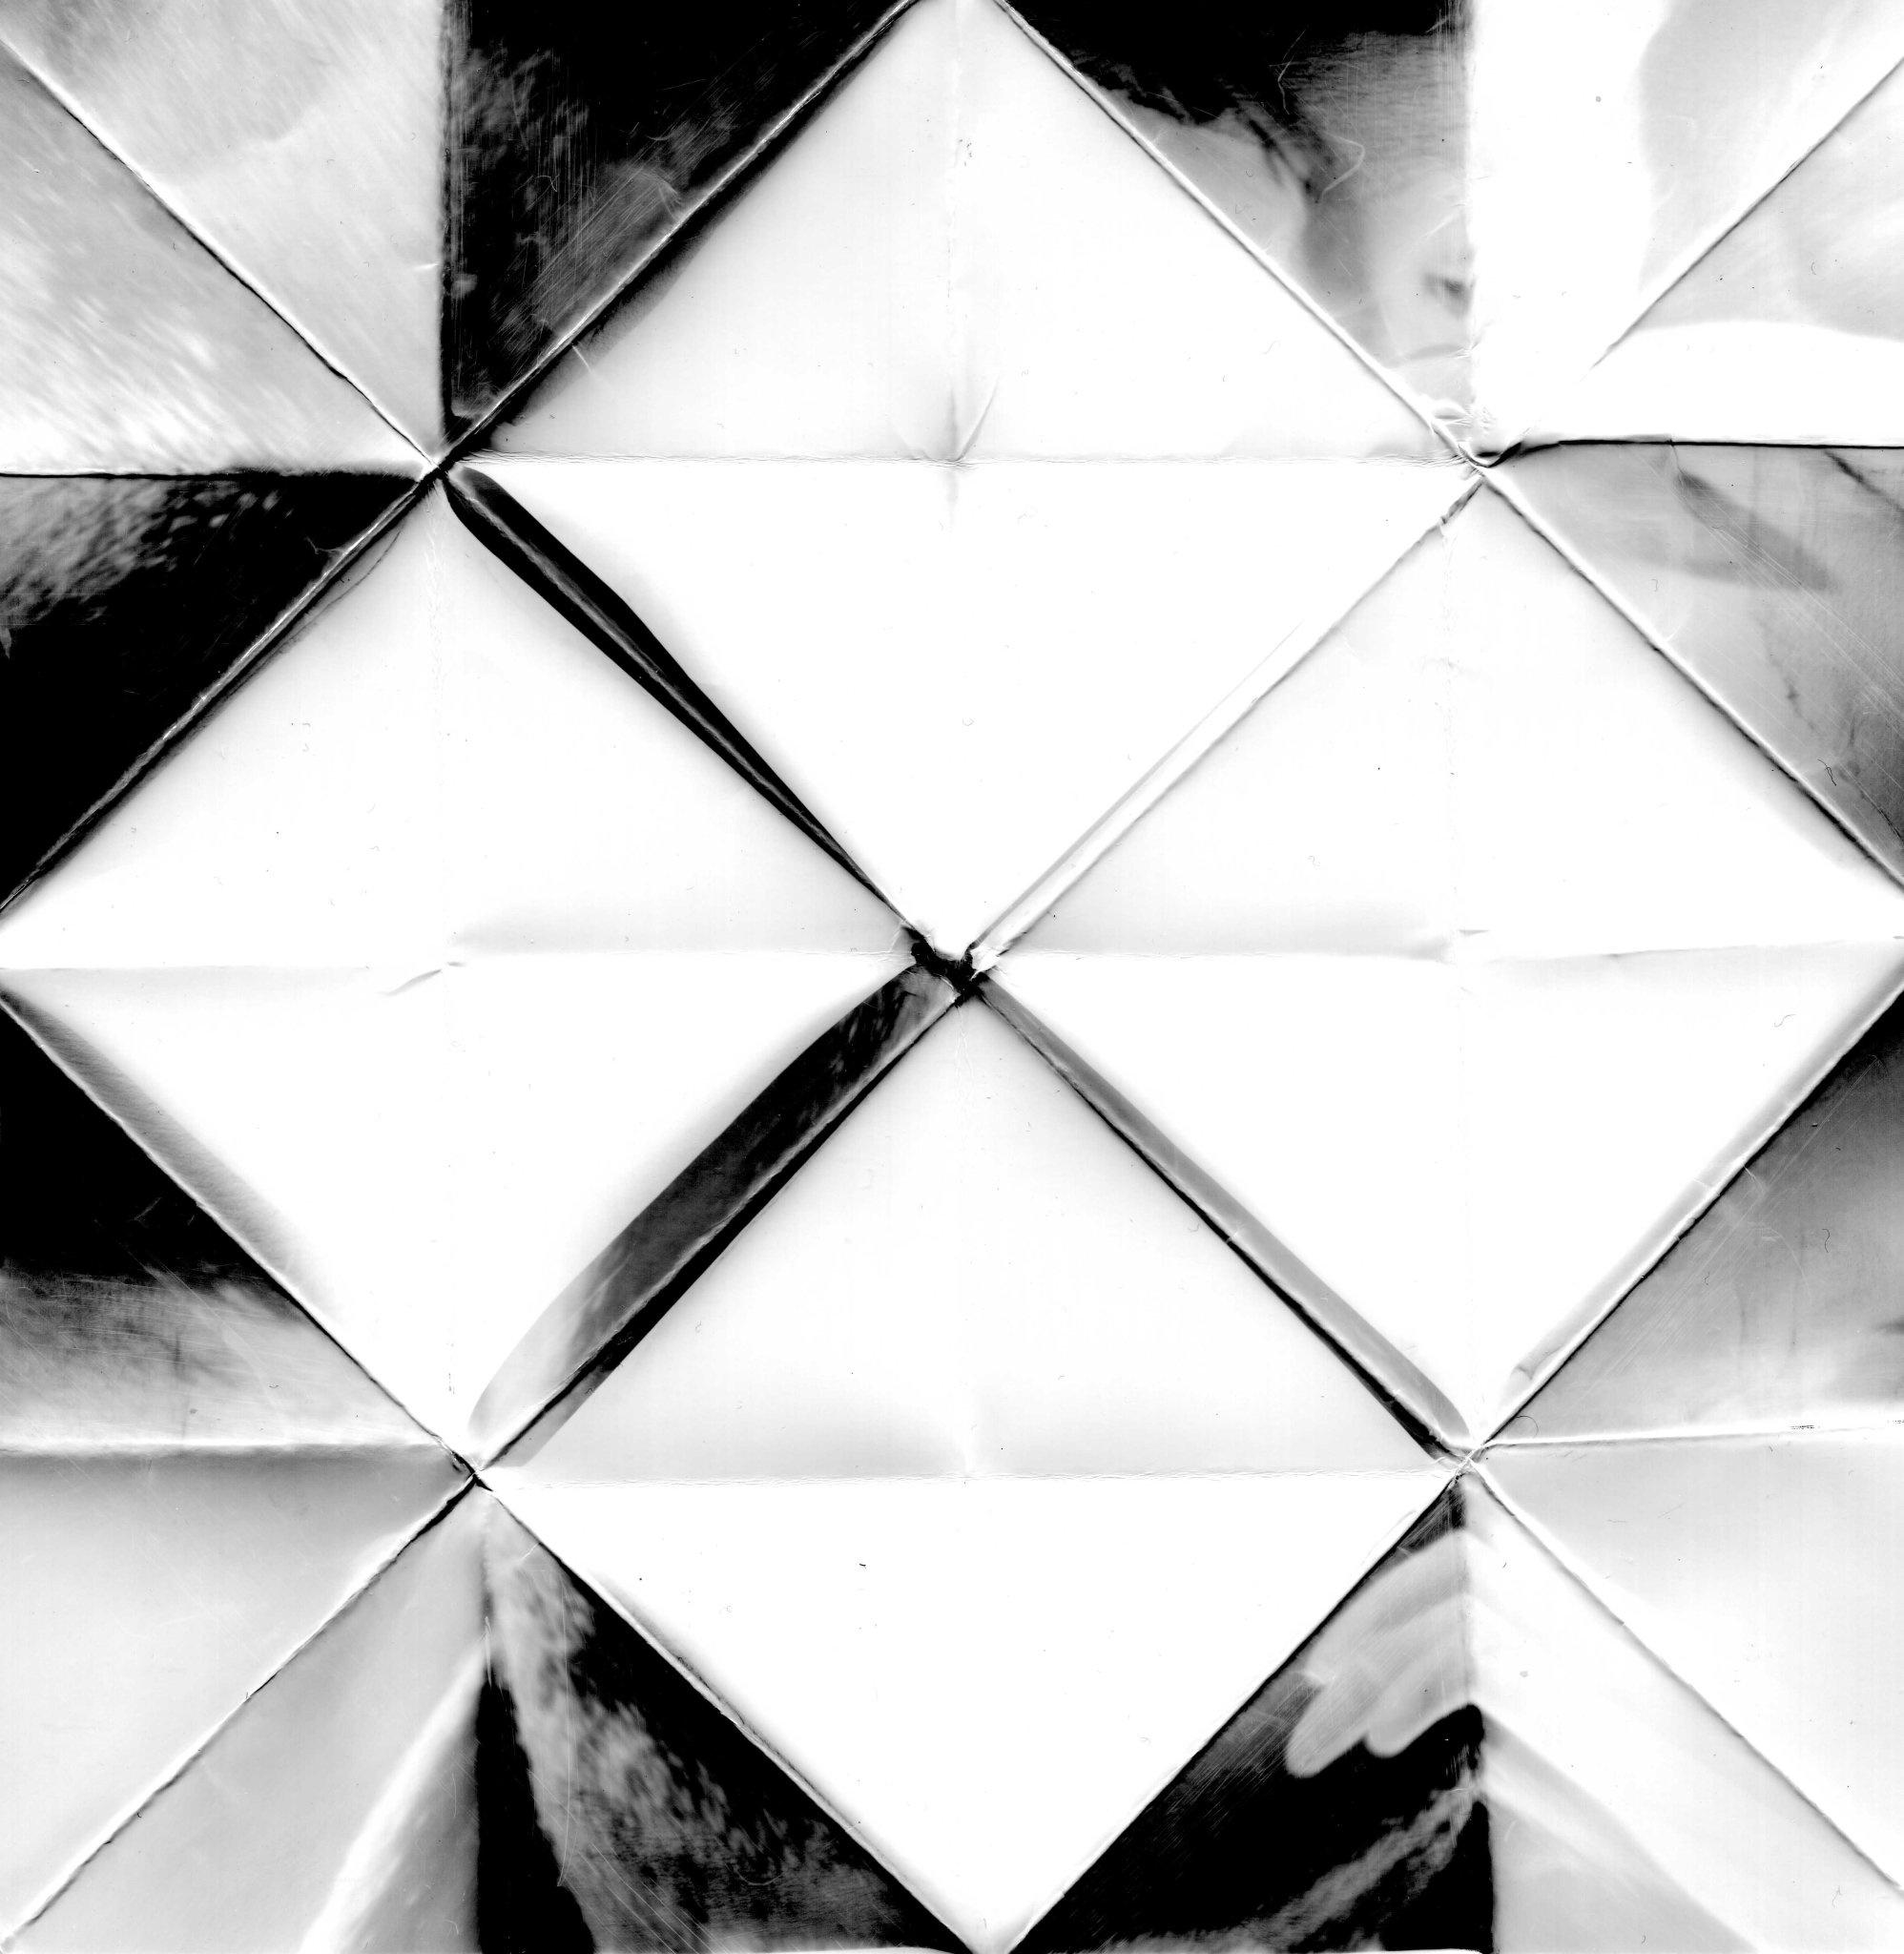 Boxface_1_vii-1